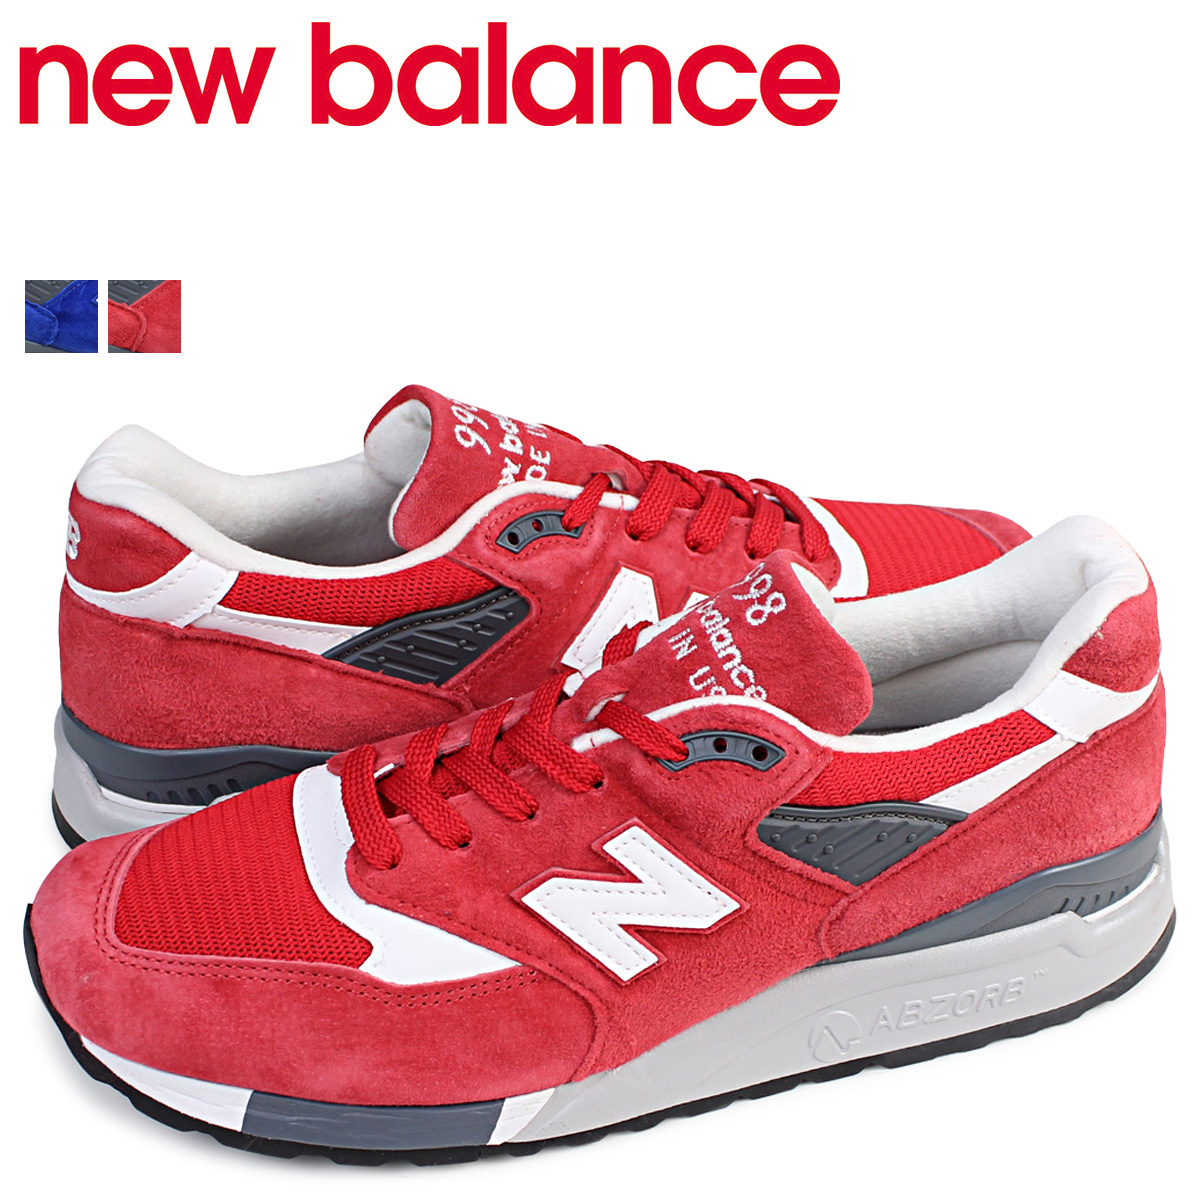 new balance 18